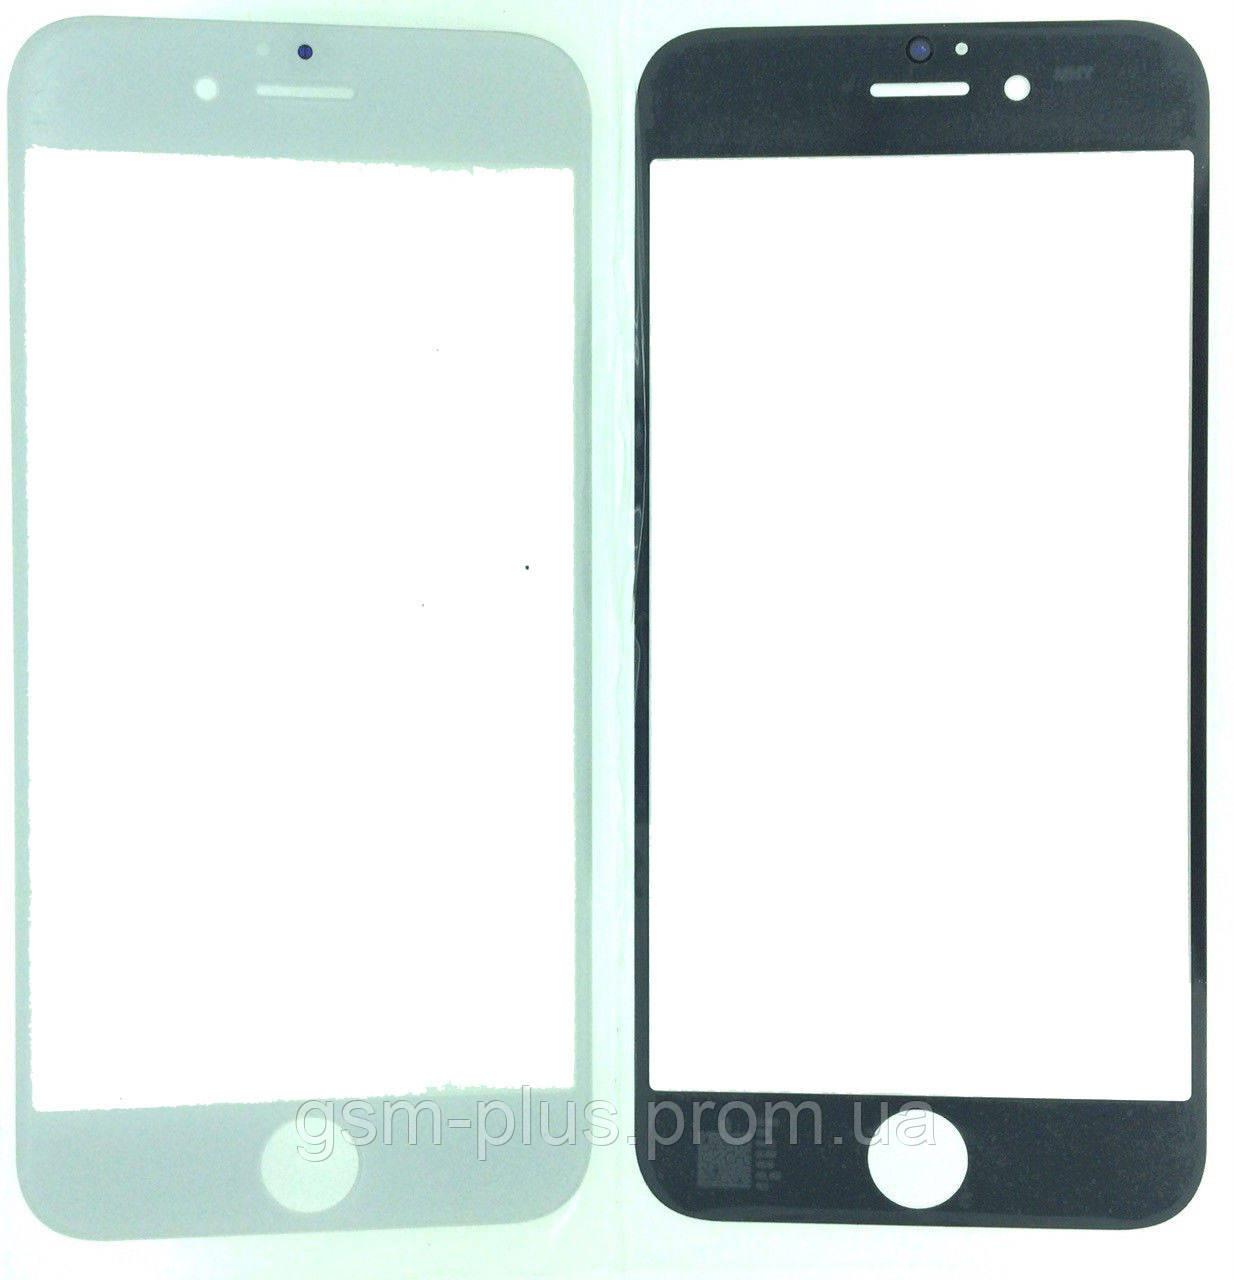 "Стекло дисплея iPhone 6S (4.7"") White (для переклейки)"